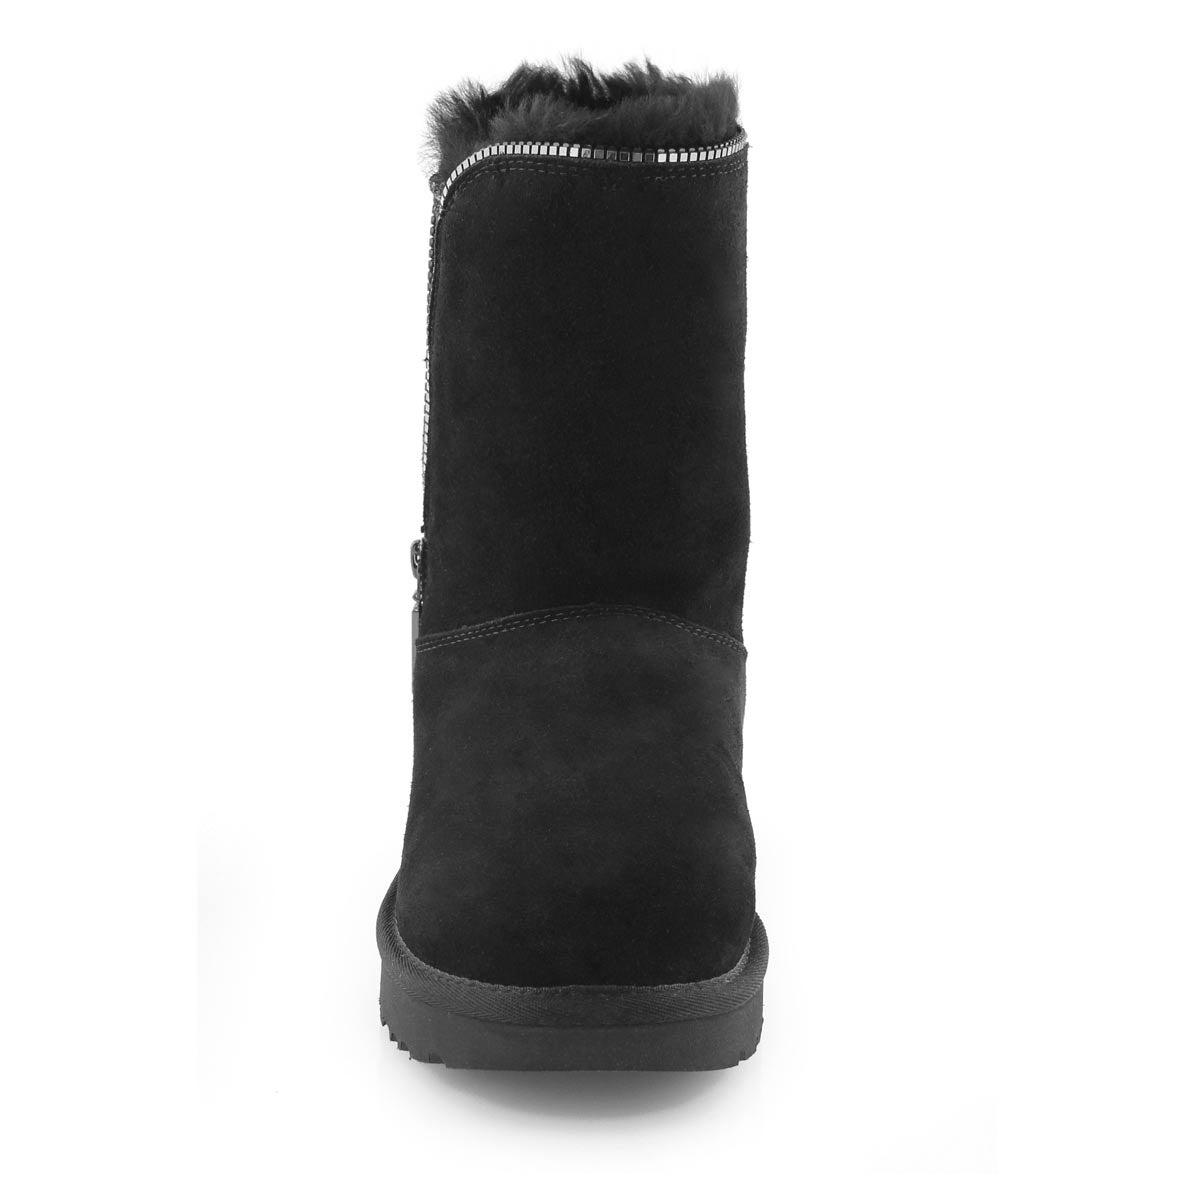 Lds Classic Zip black sheepskin boot